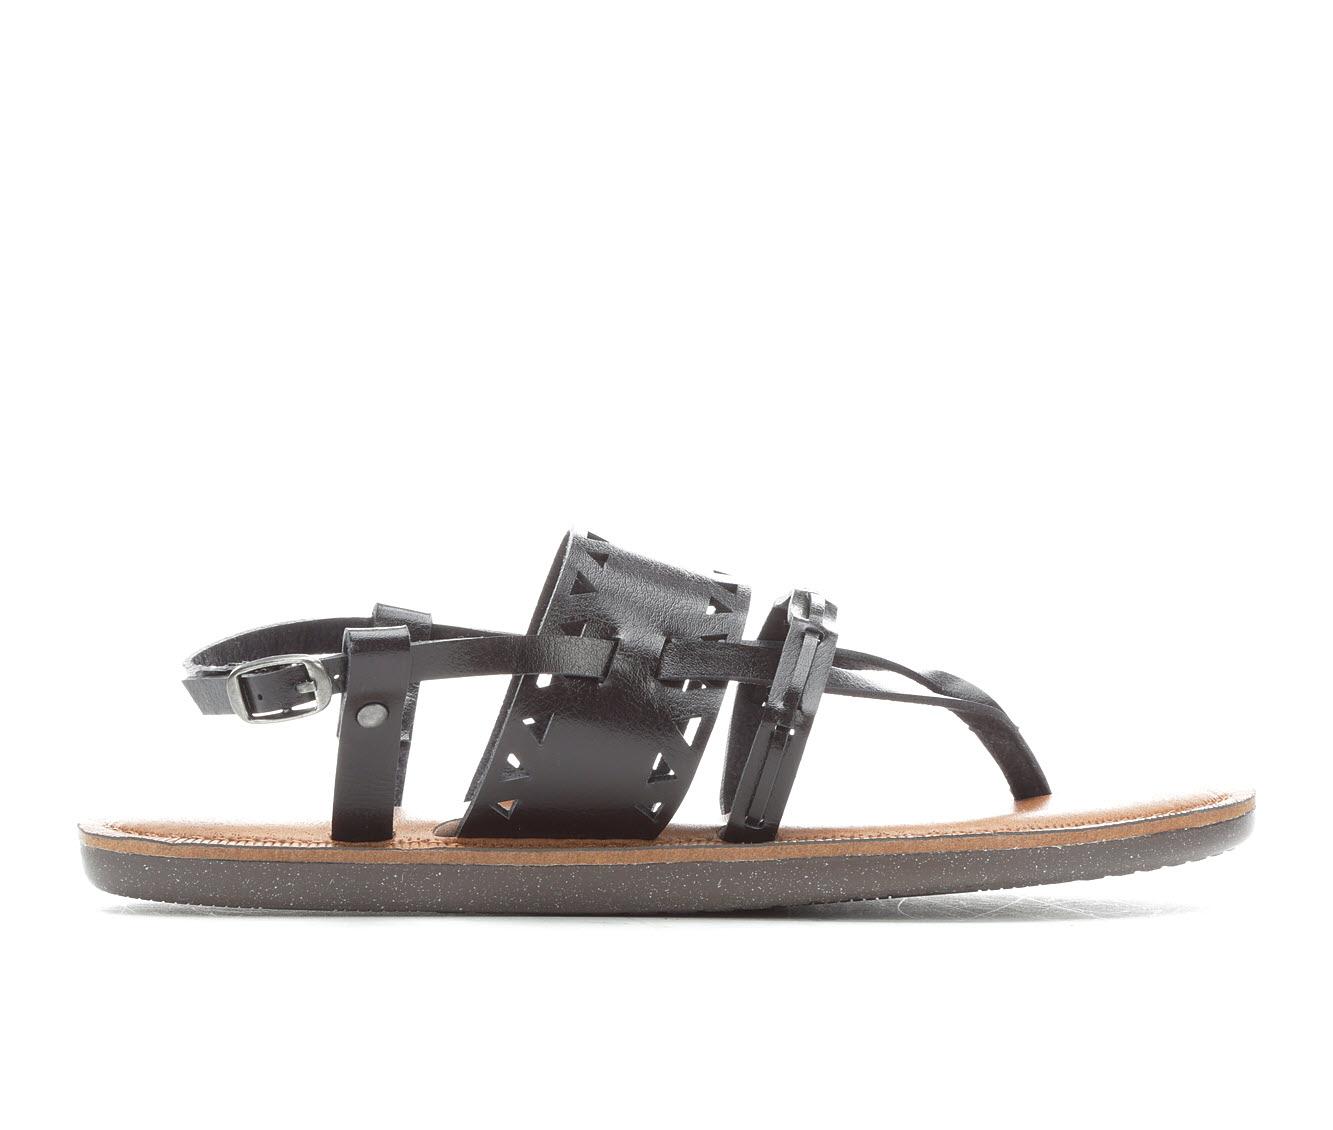 Vintage 7 Eight Pandora Women's Sandal (Black Faux Leather)